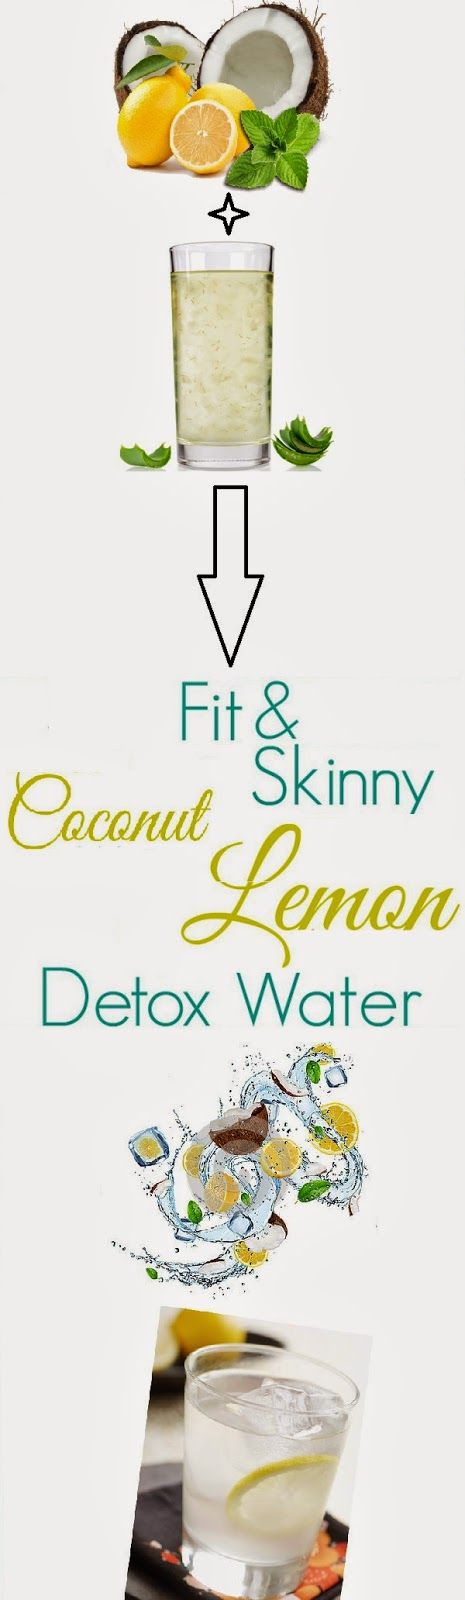 Skin Care And Health Tips: Fit & Skinny Coconut Lemon Detox Water Recipe 1/2 C Coconut Water 2 T Lemon Juice 2 T Pure Aloe Vera Juice 1 C Filtered Water